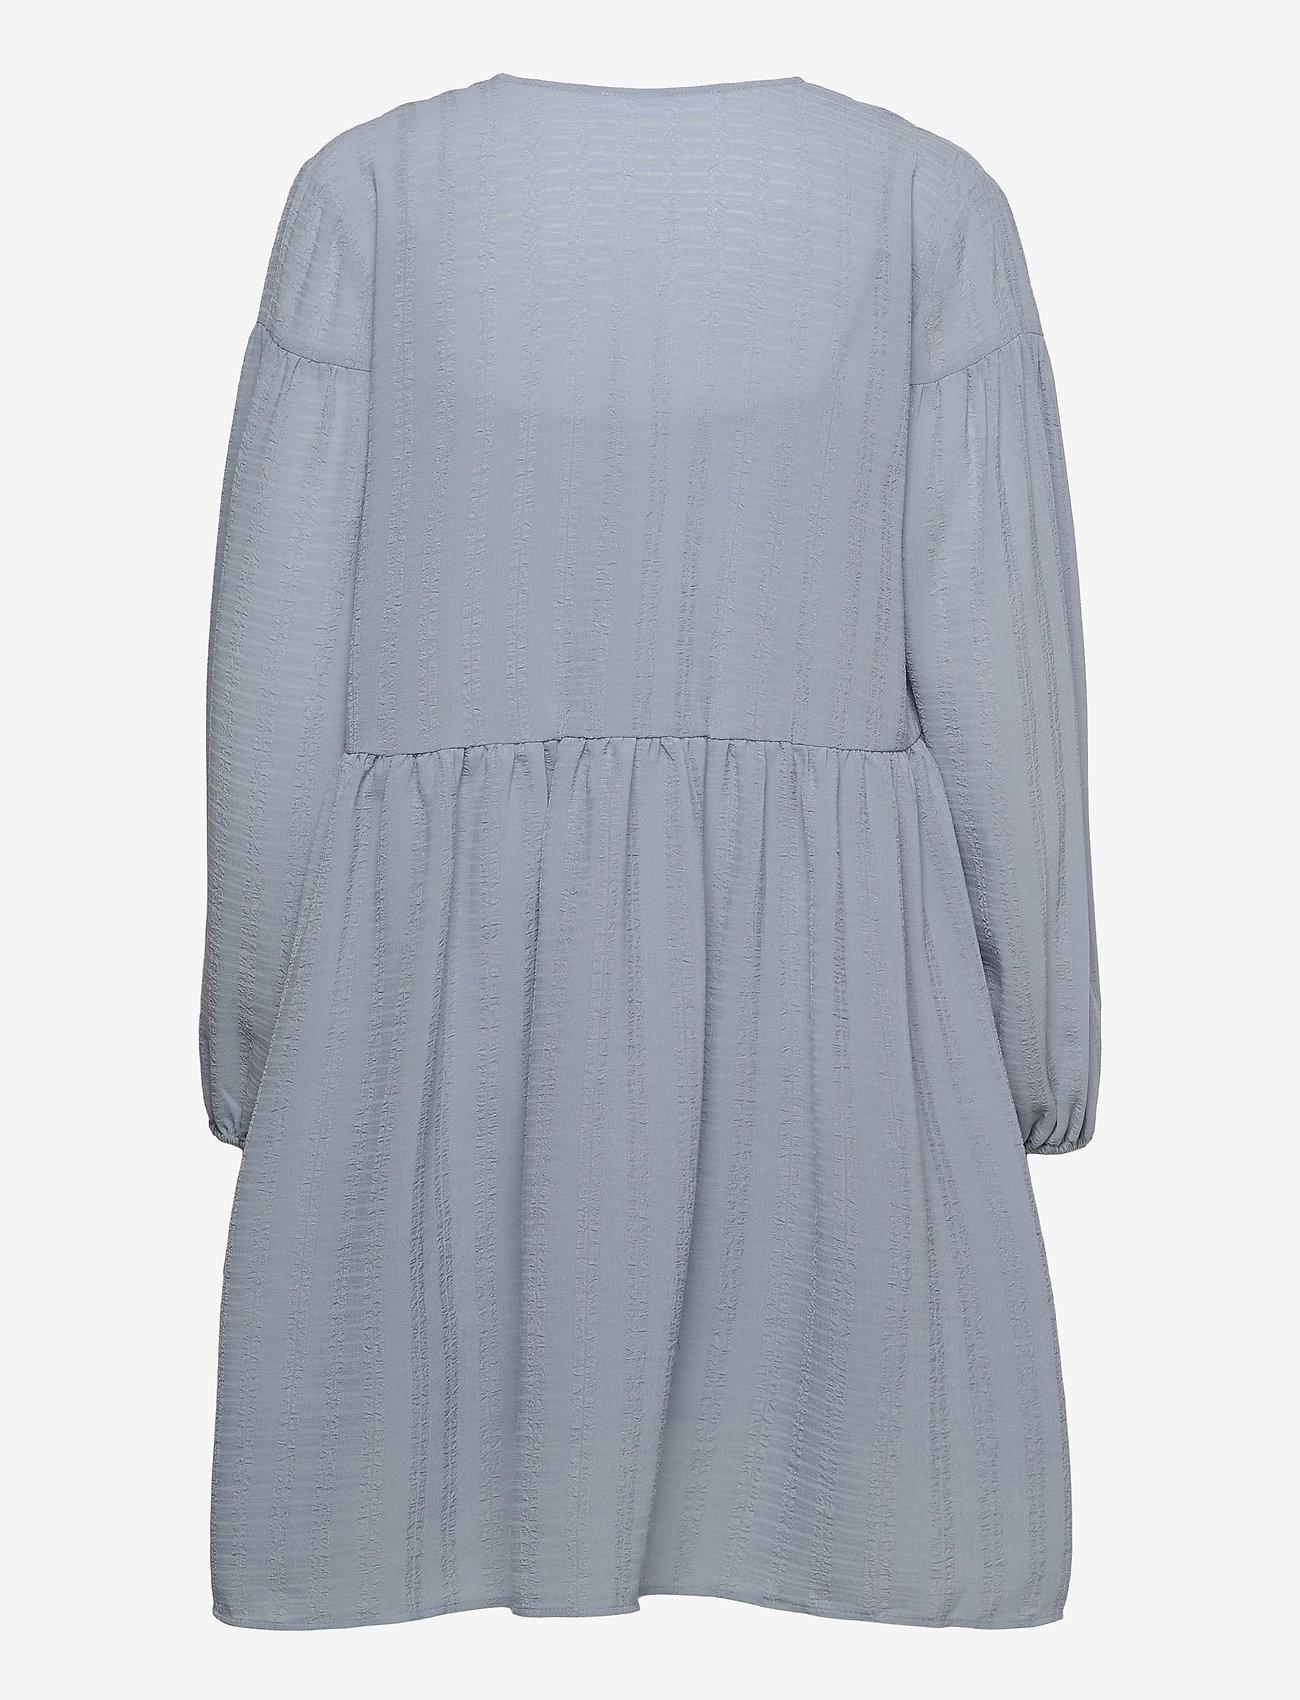 Samsøe Samsøe - Jolie short dress 12697 - summer dresses - dusty blue - 2